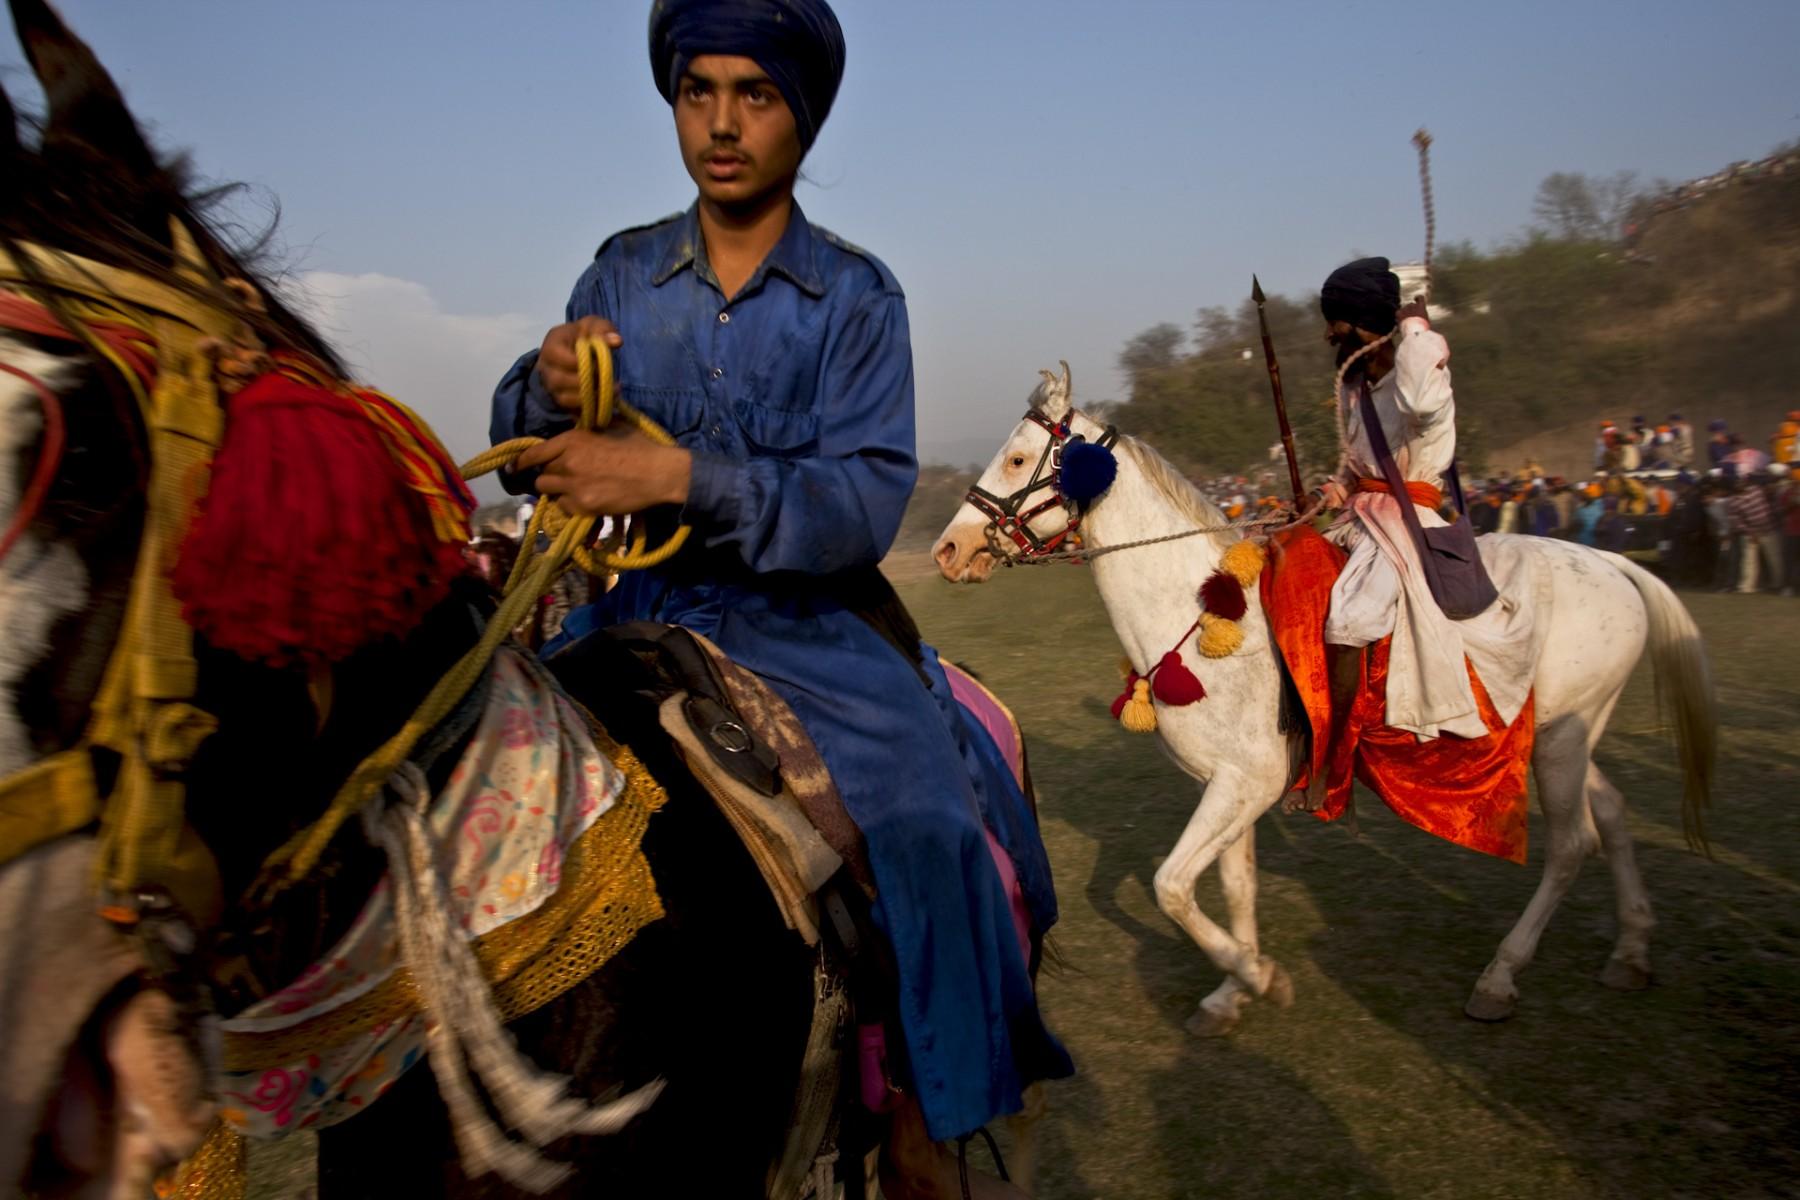 Nihangs on horseback at Hola